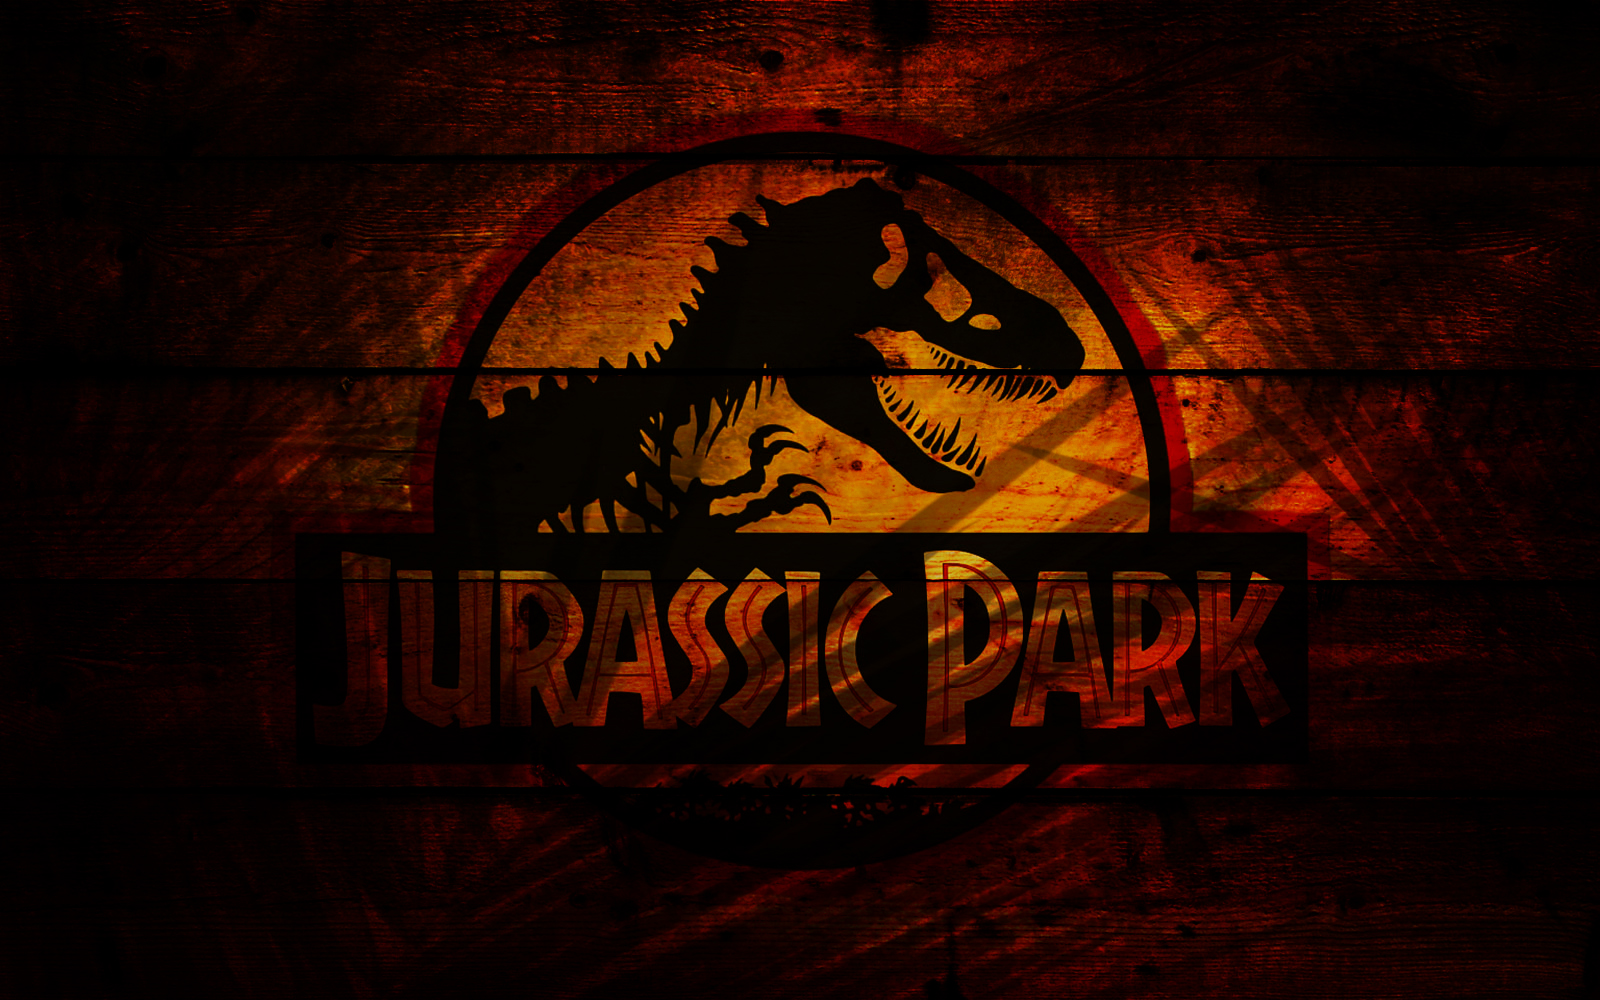 Jurassic park card 3 by chicagocubsfan24 on deviantart - Jurassic Park By Stijnarts